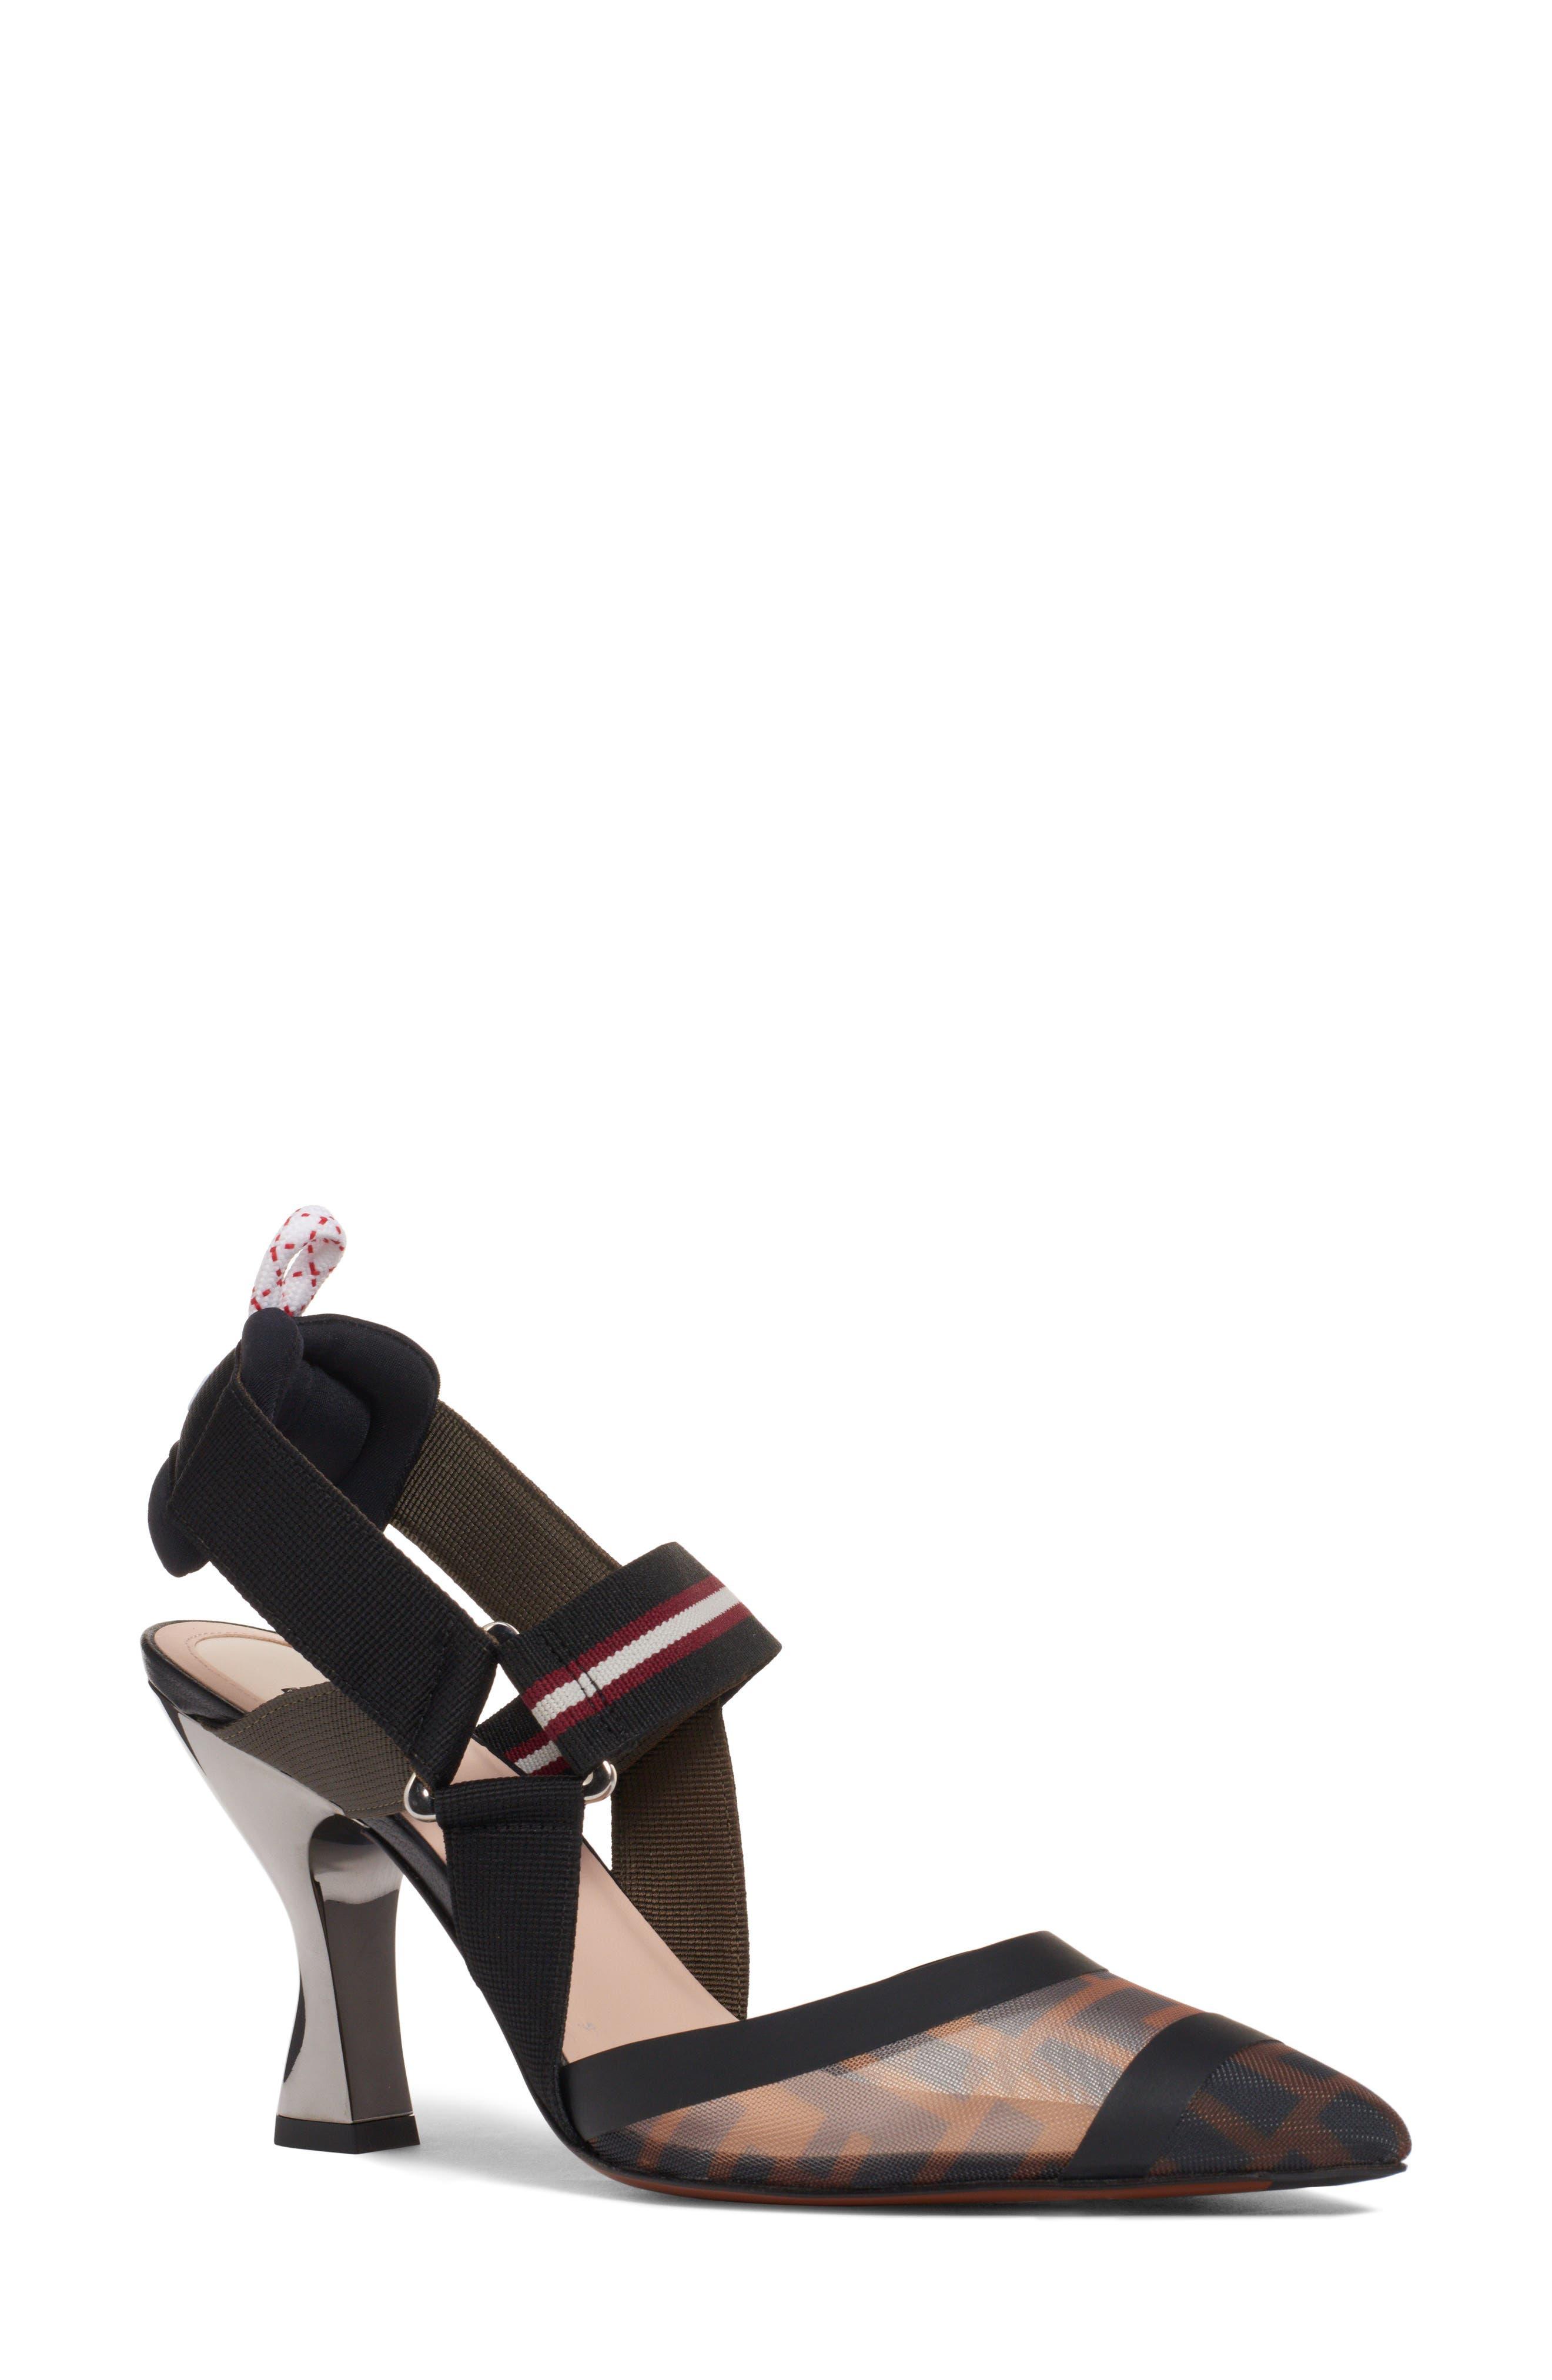 Fendi Colibri Slingback Pump - Black